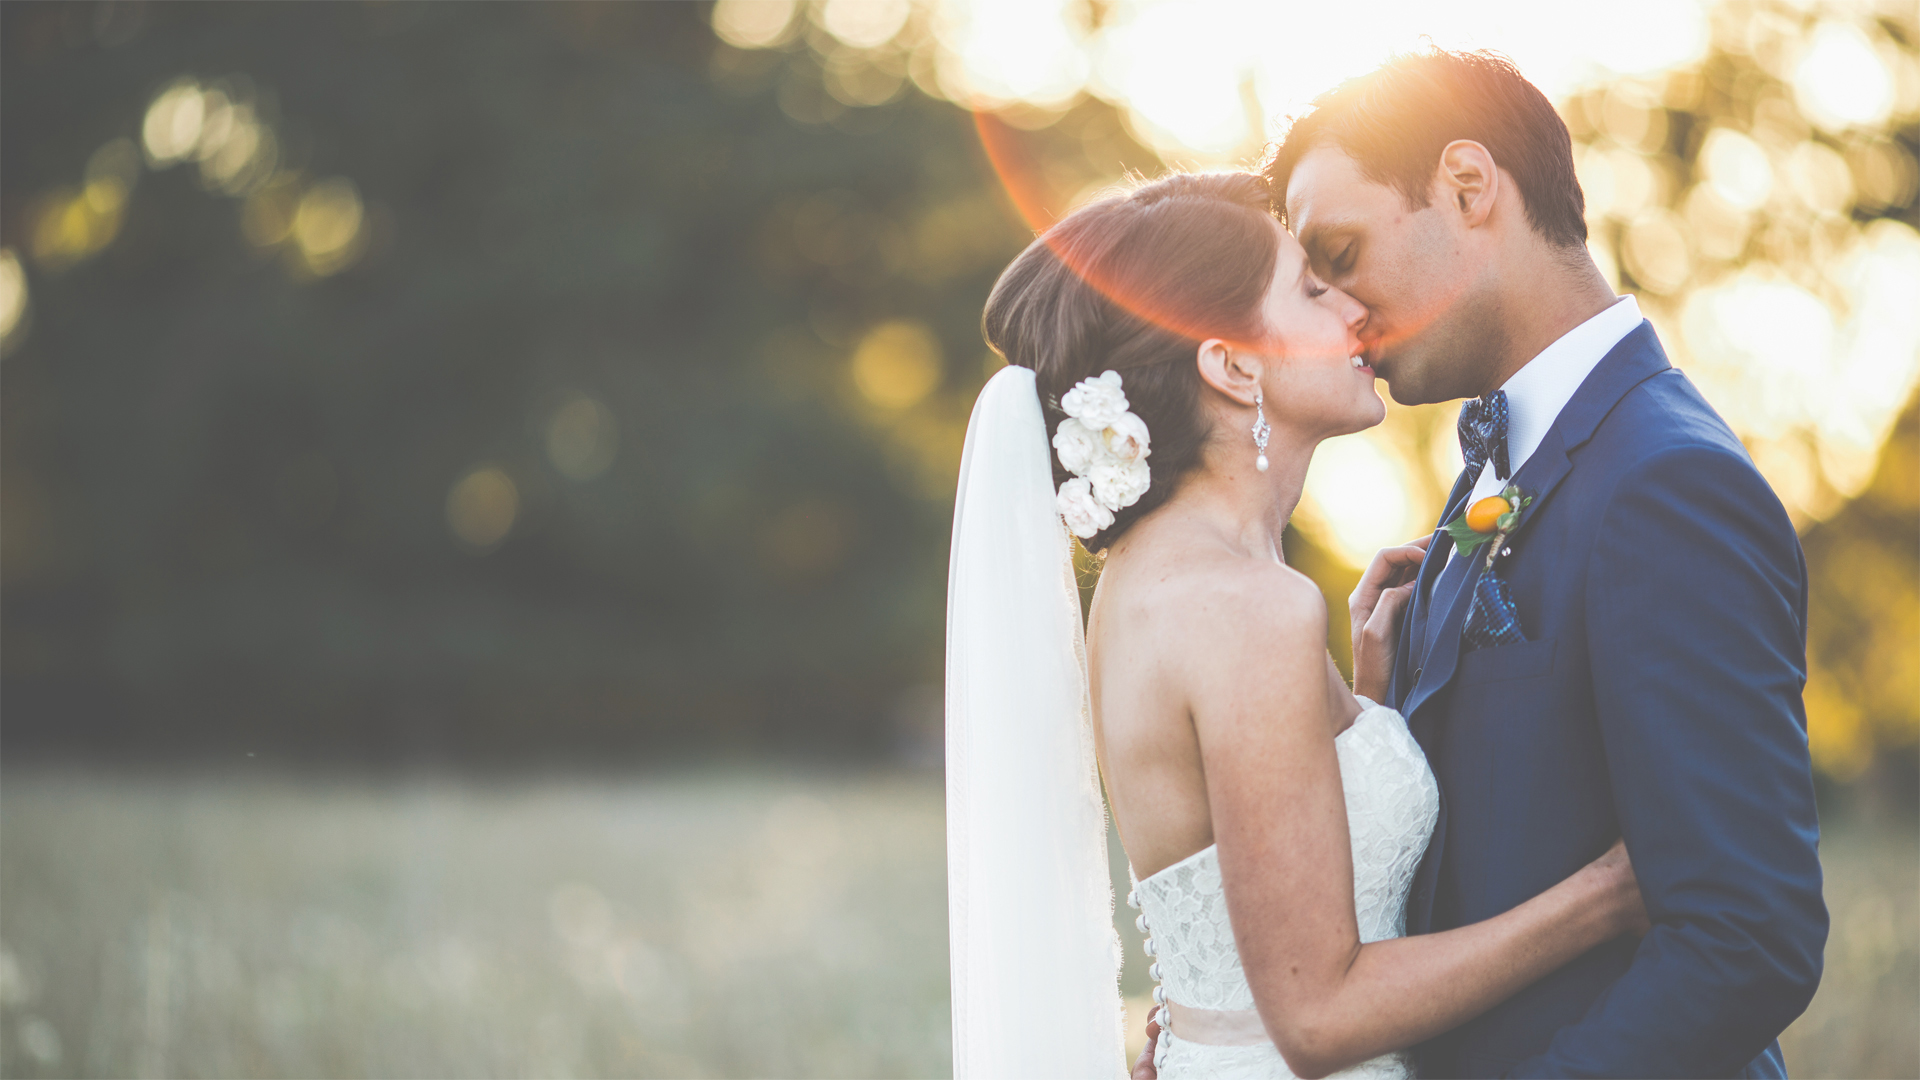 01. Generic couple kissing outside copy(opacity 90)